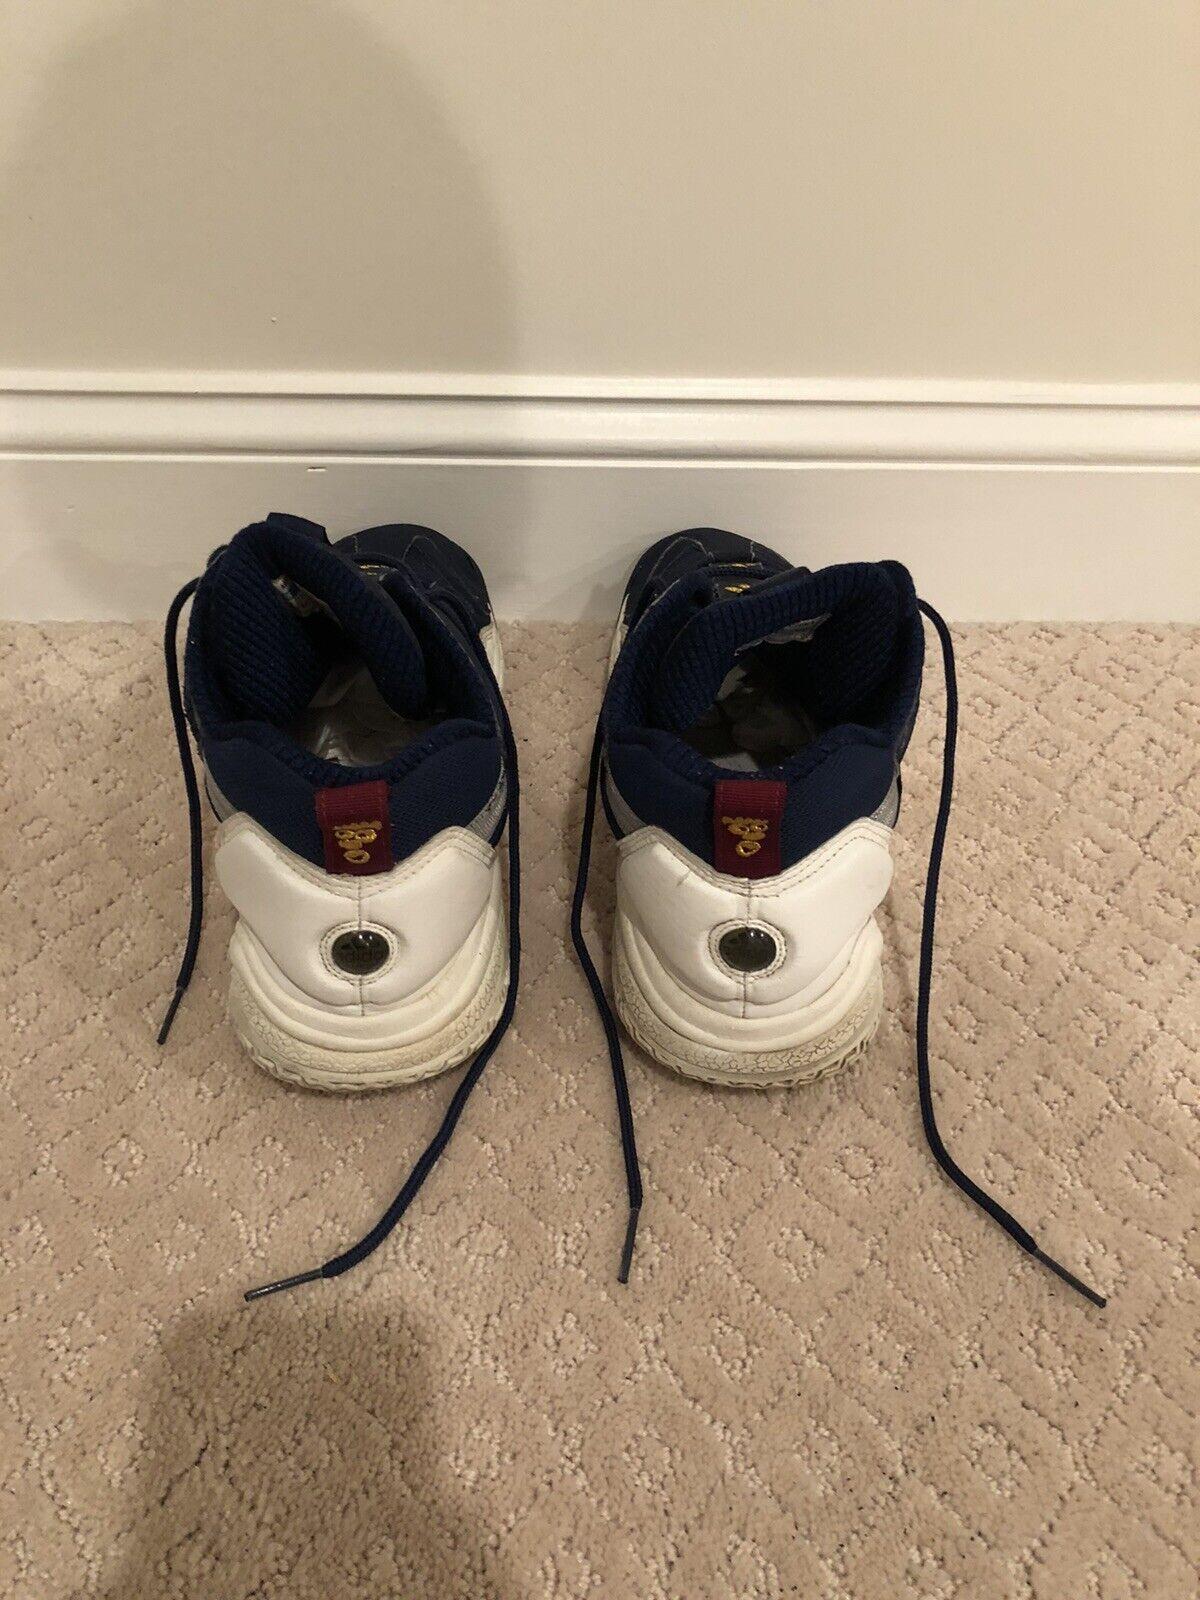 Kobe Bryant Adidas Sneakers. - image 8